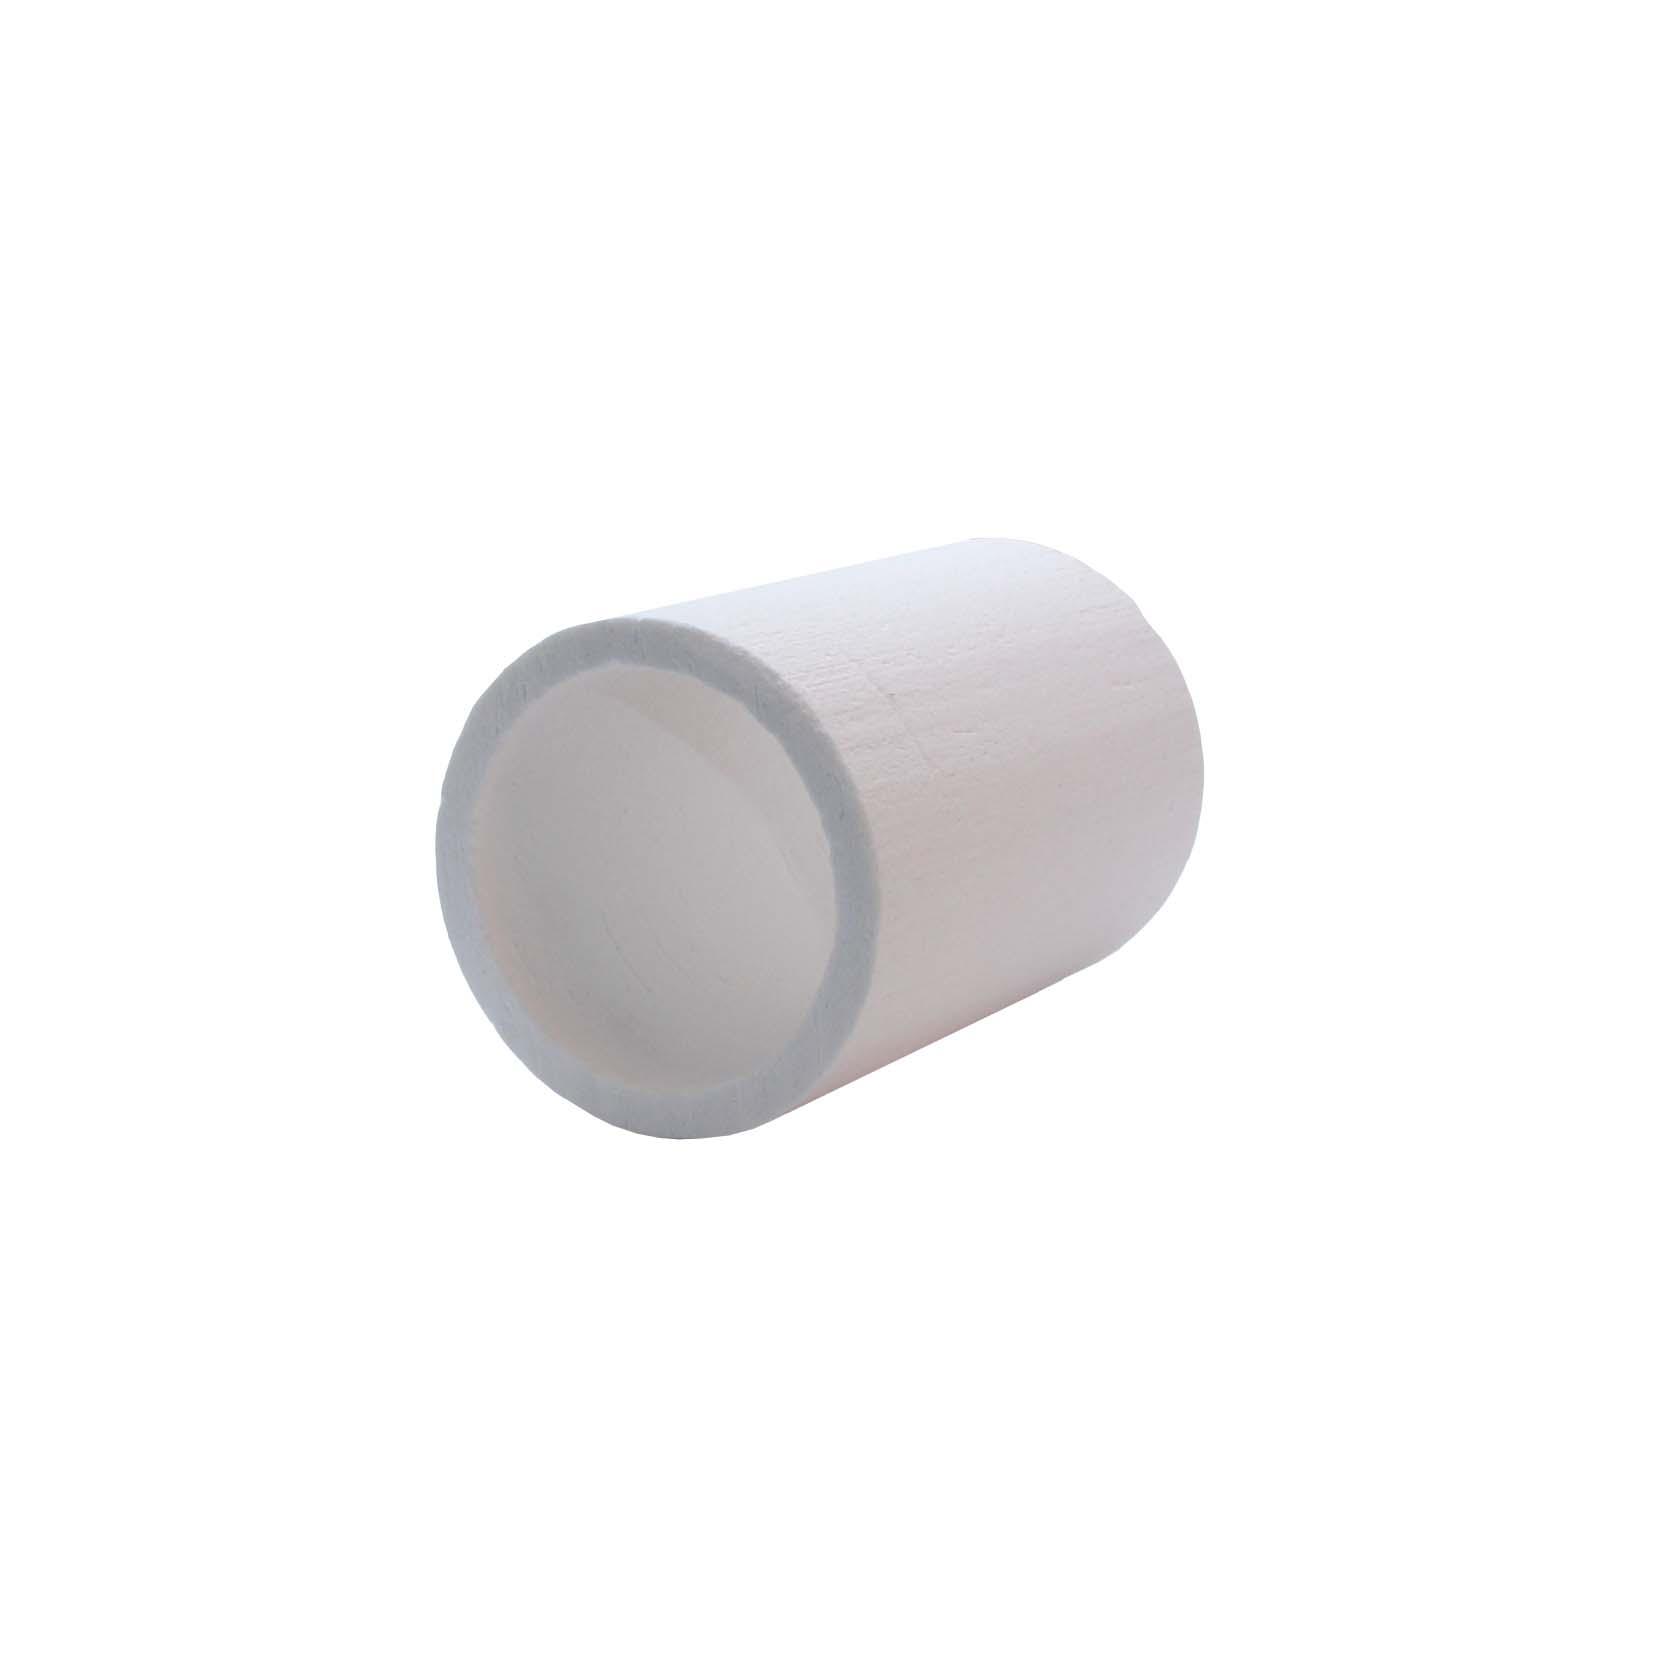 Теплоизоляция тигля Da=100 Di=79 L=140 до 1500 грС VC500-600, СС400 11010100